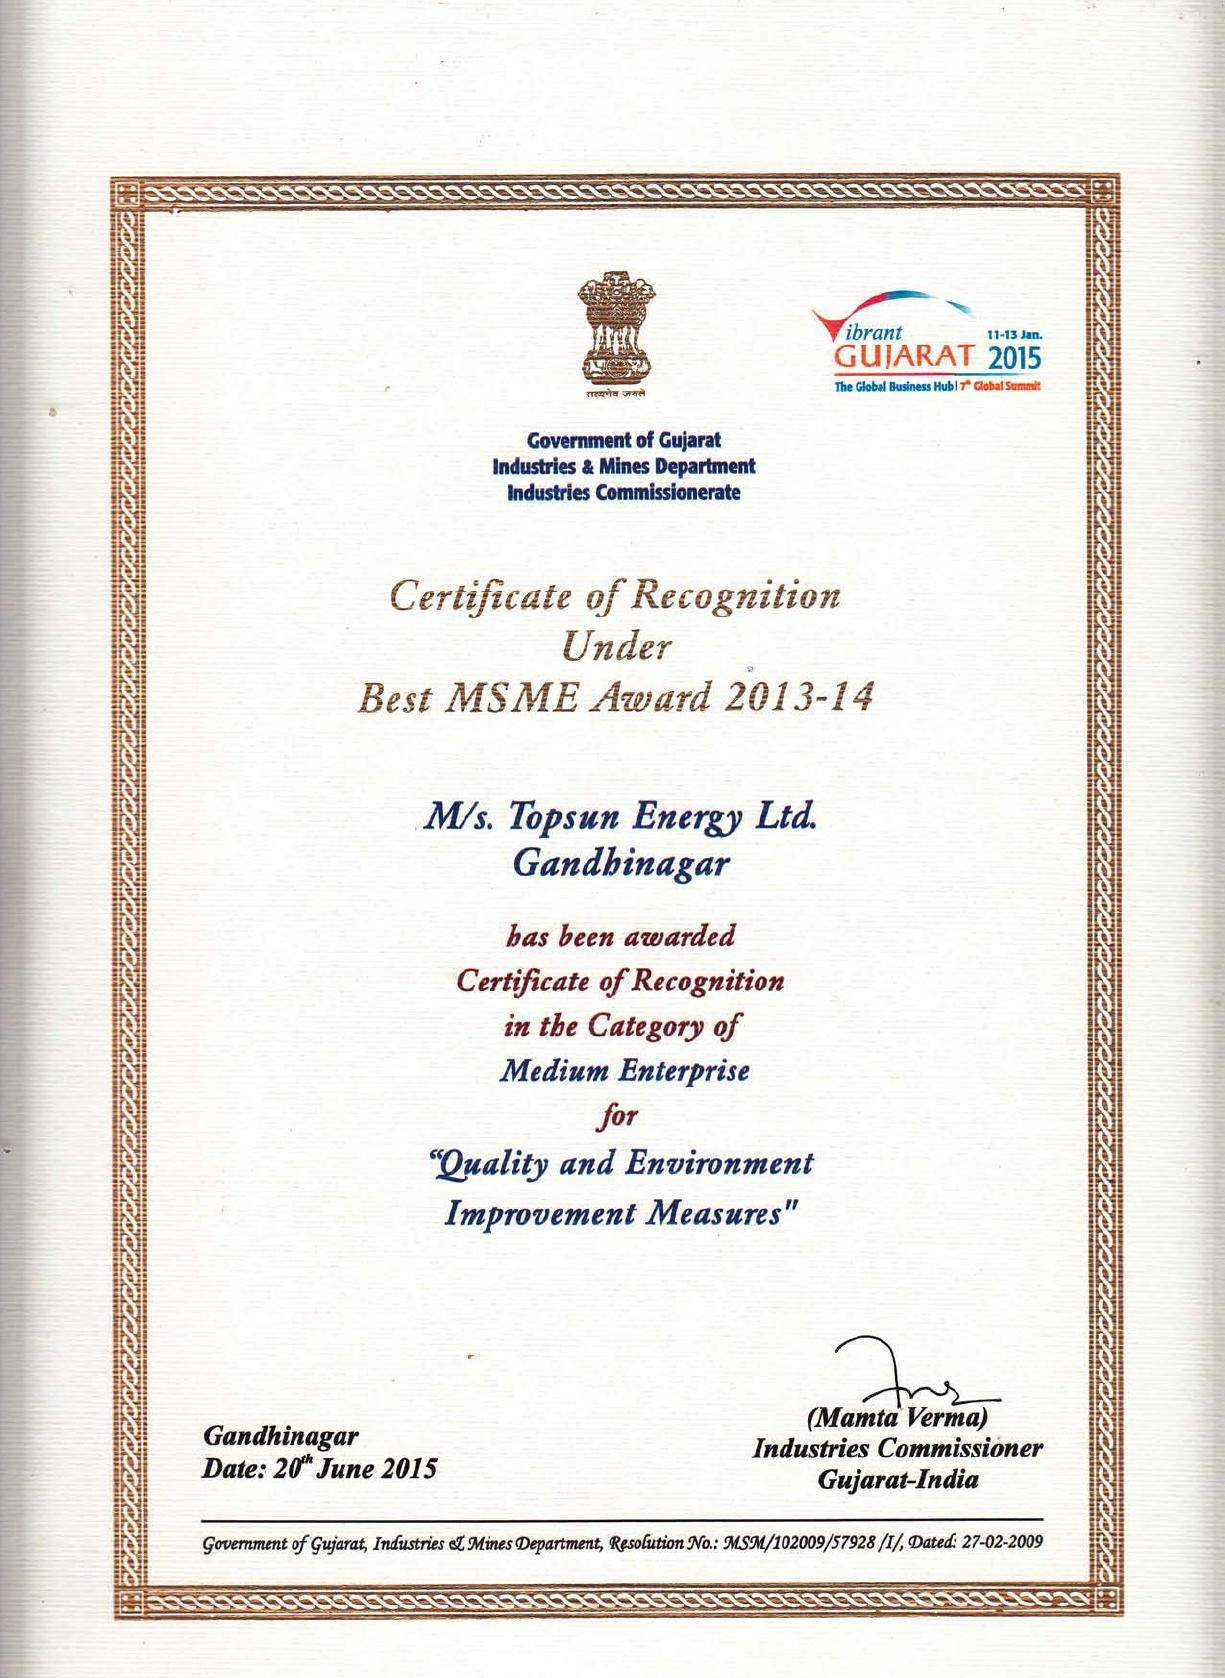 MSME-Award-Quality-Environment